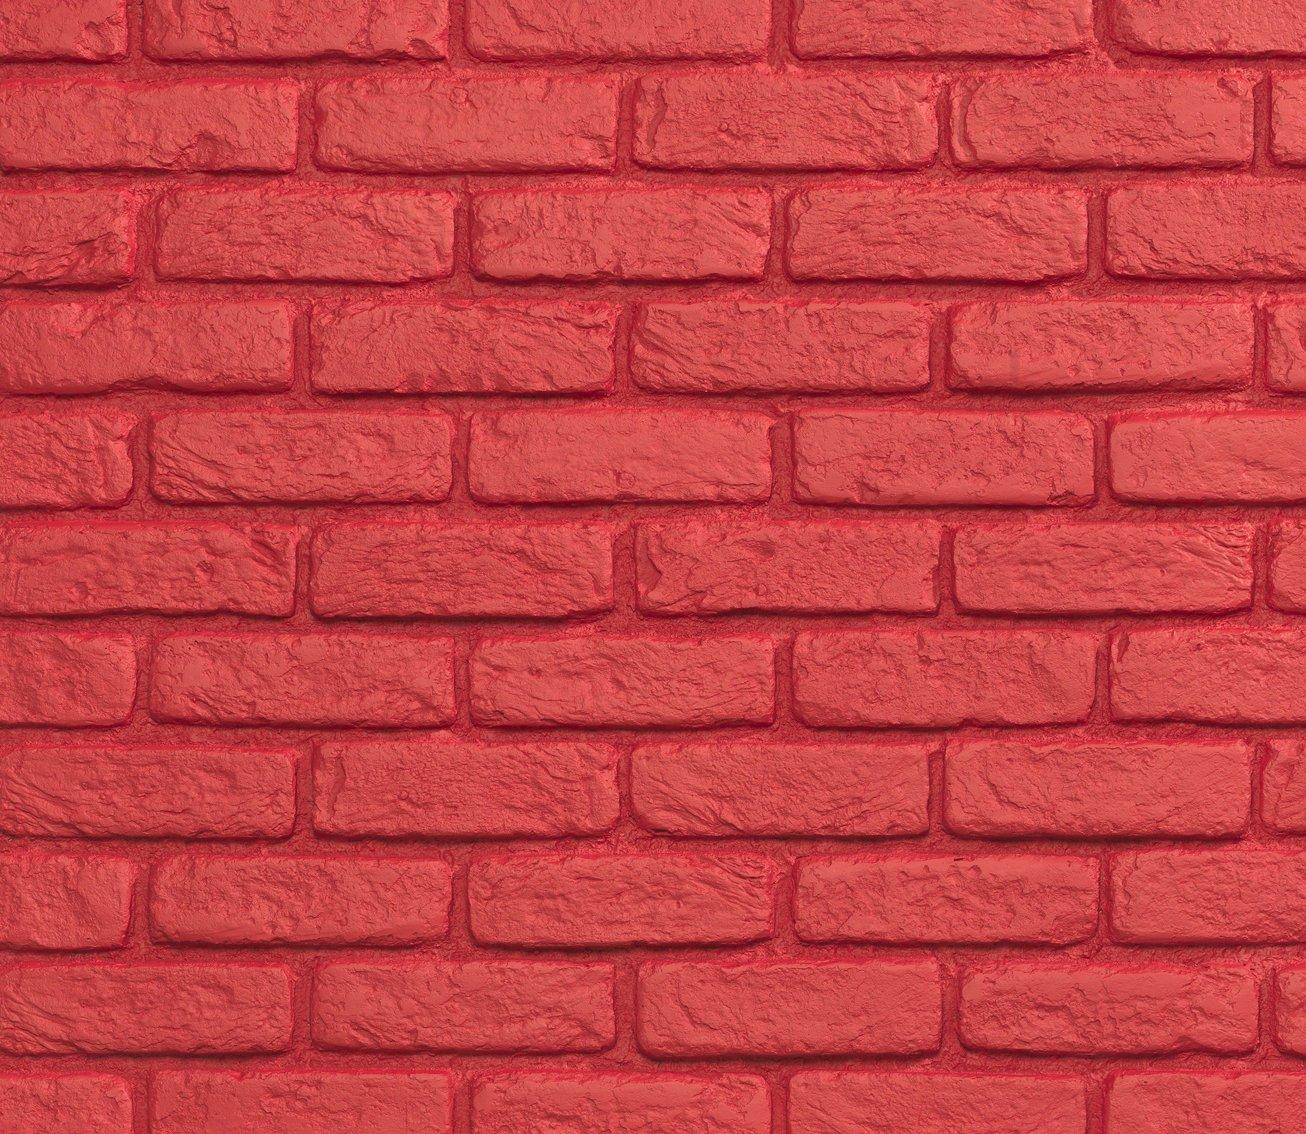 PX 084 3002 Urban Brick